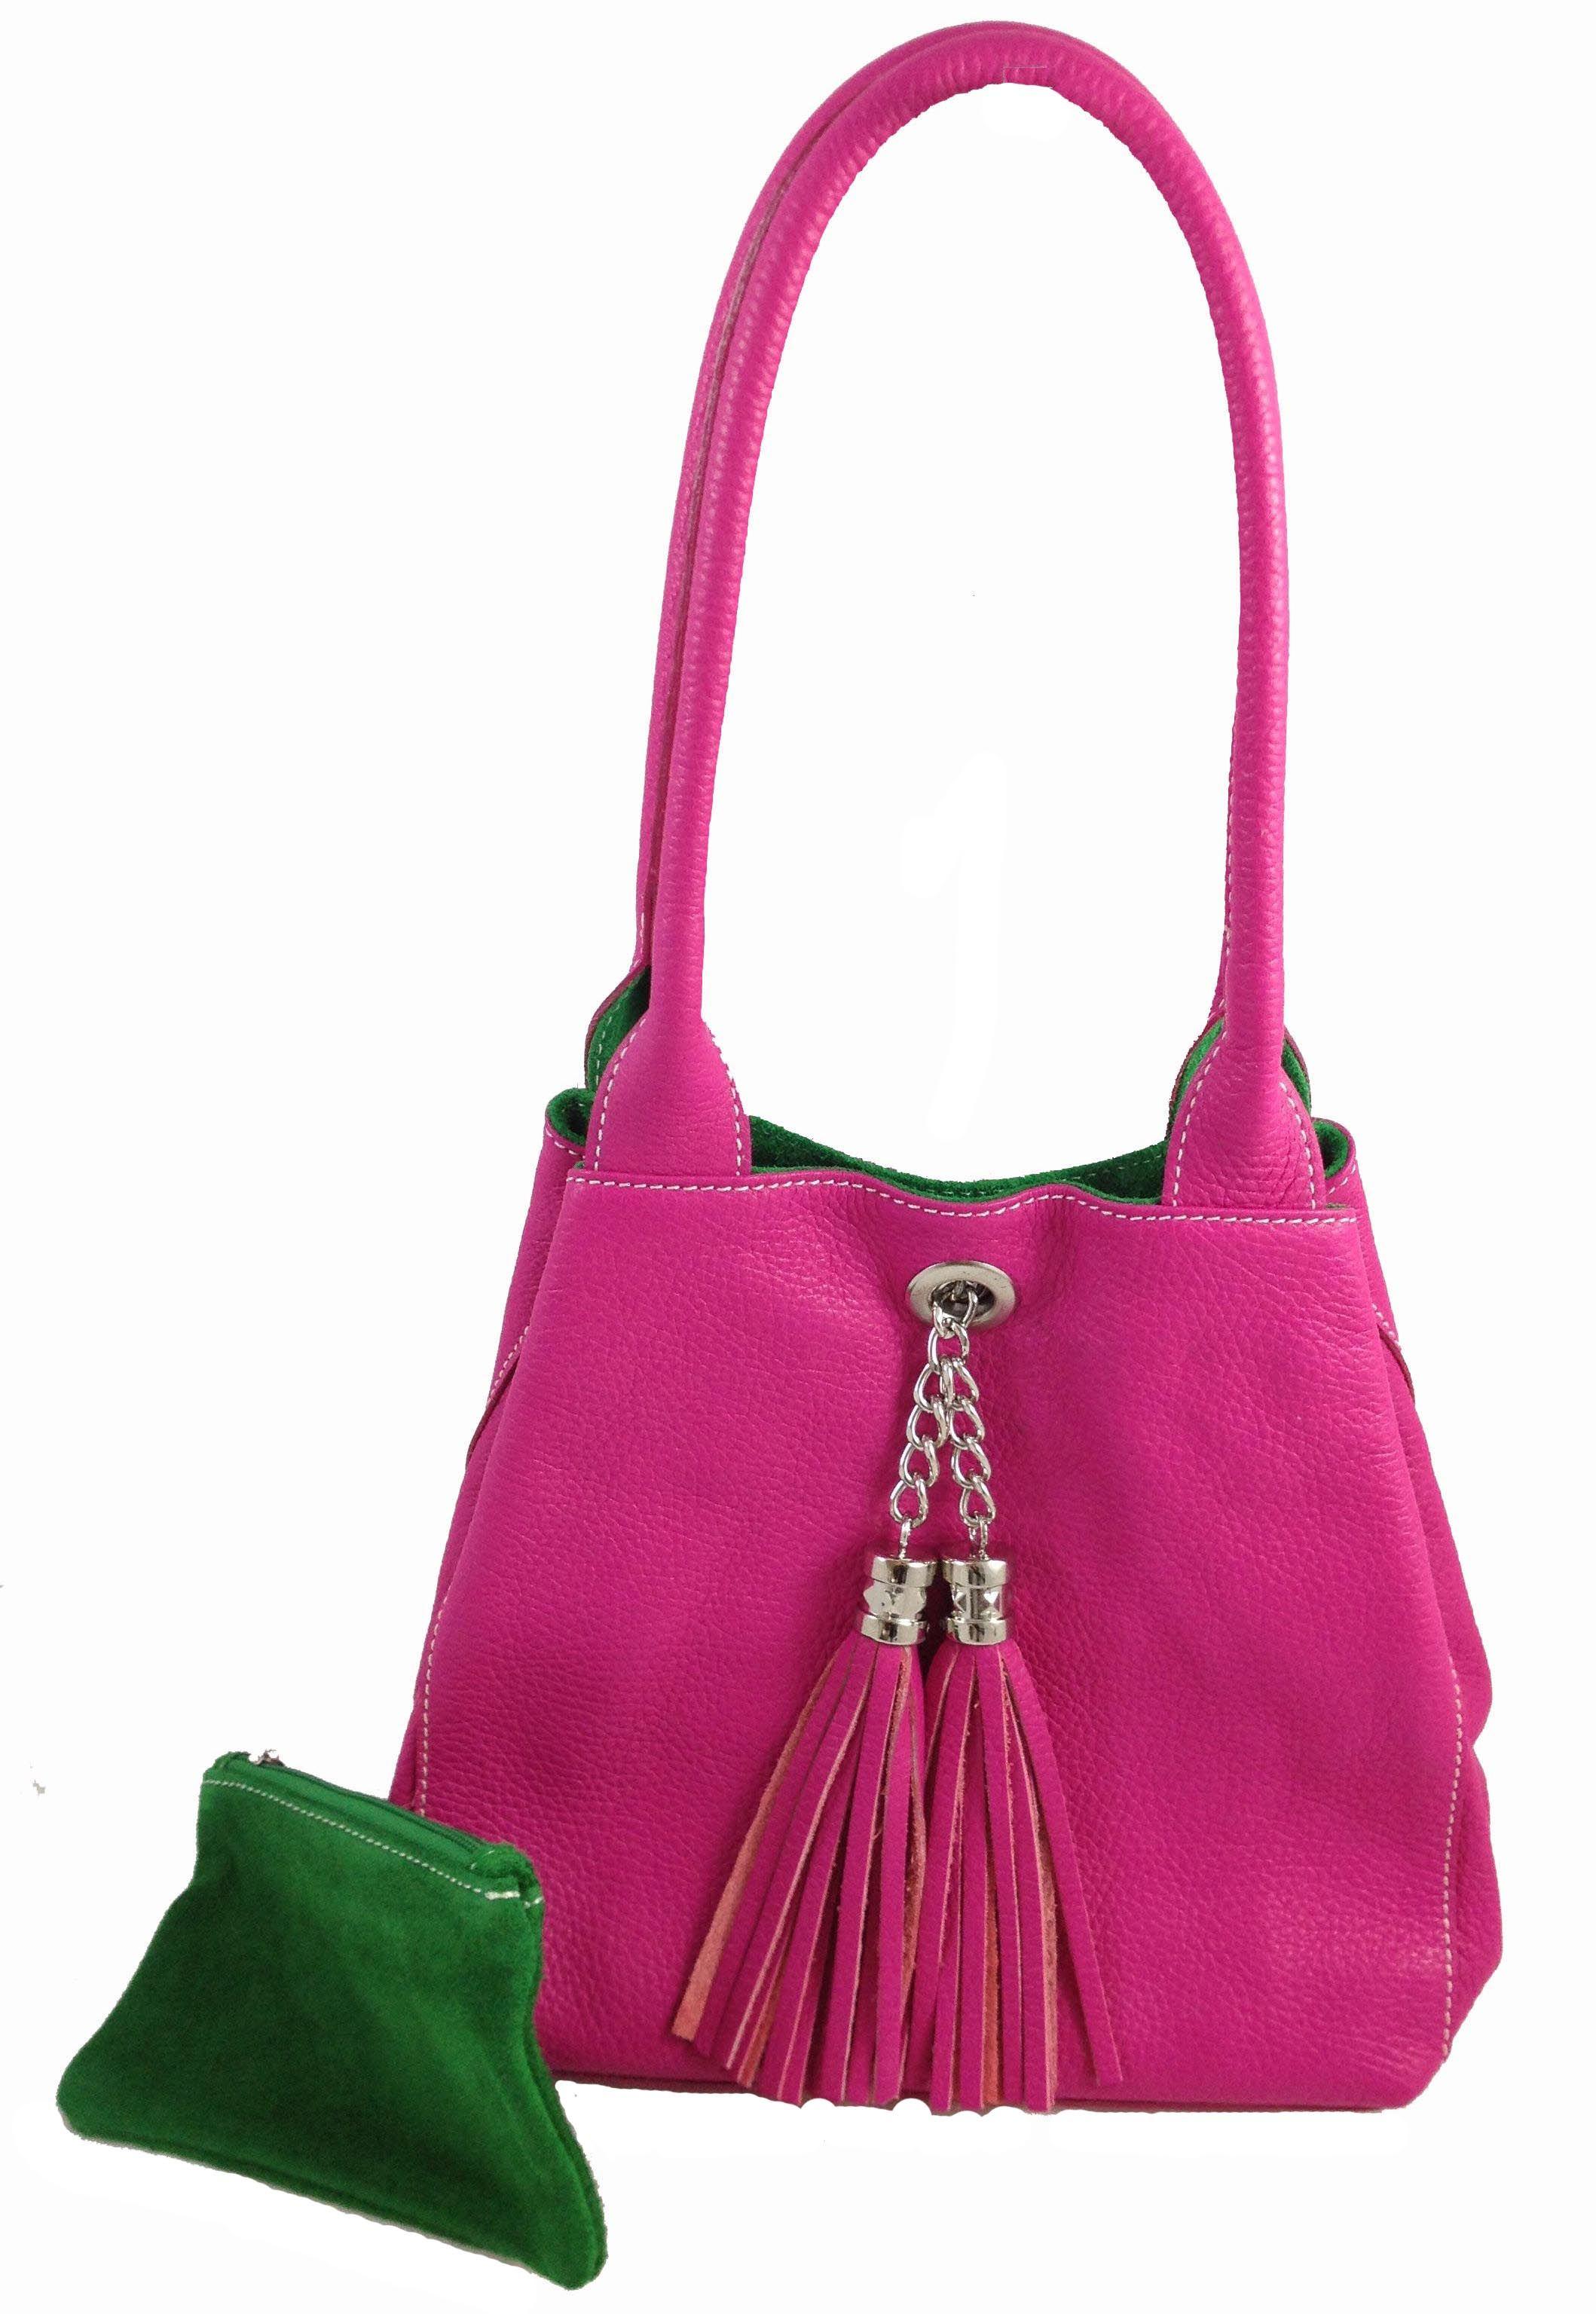 Every Needs Pink In Her Live Reversible Leather Suede Italian Handbag Bright Fuchsia Green Reversibleleatherhandbag